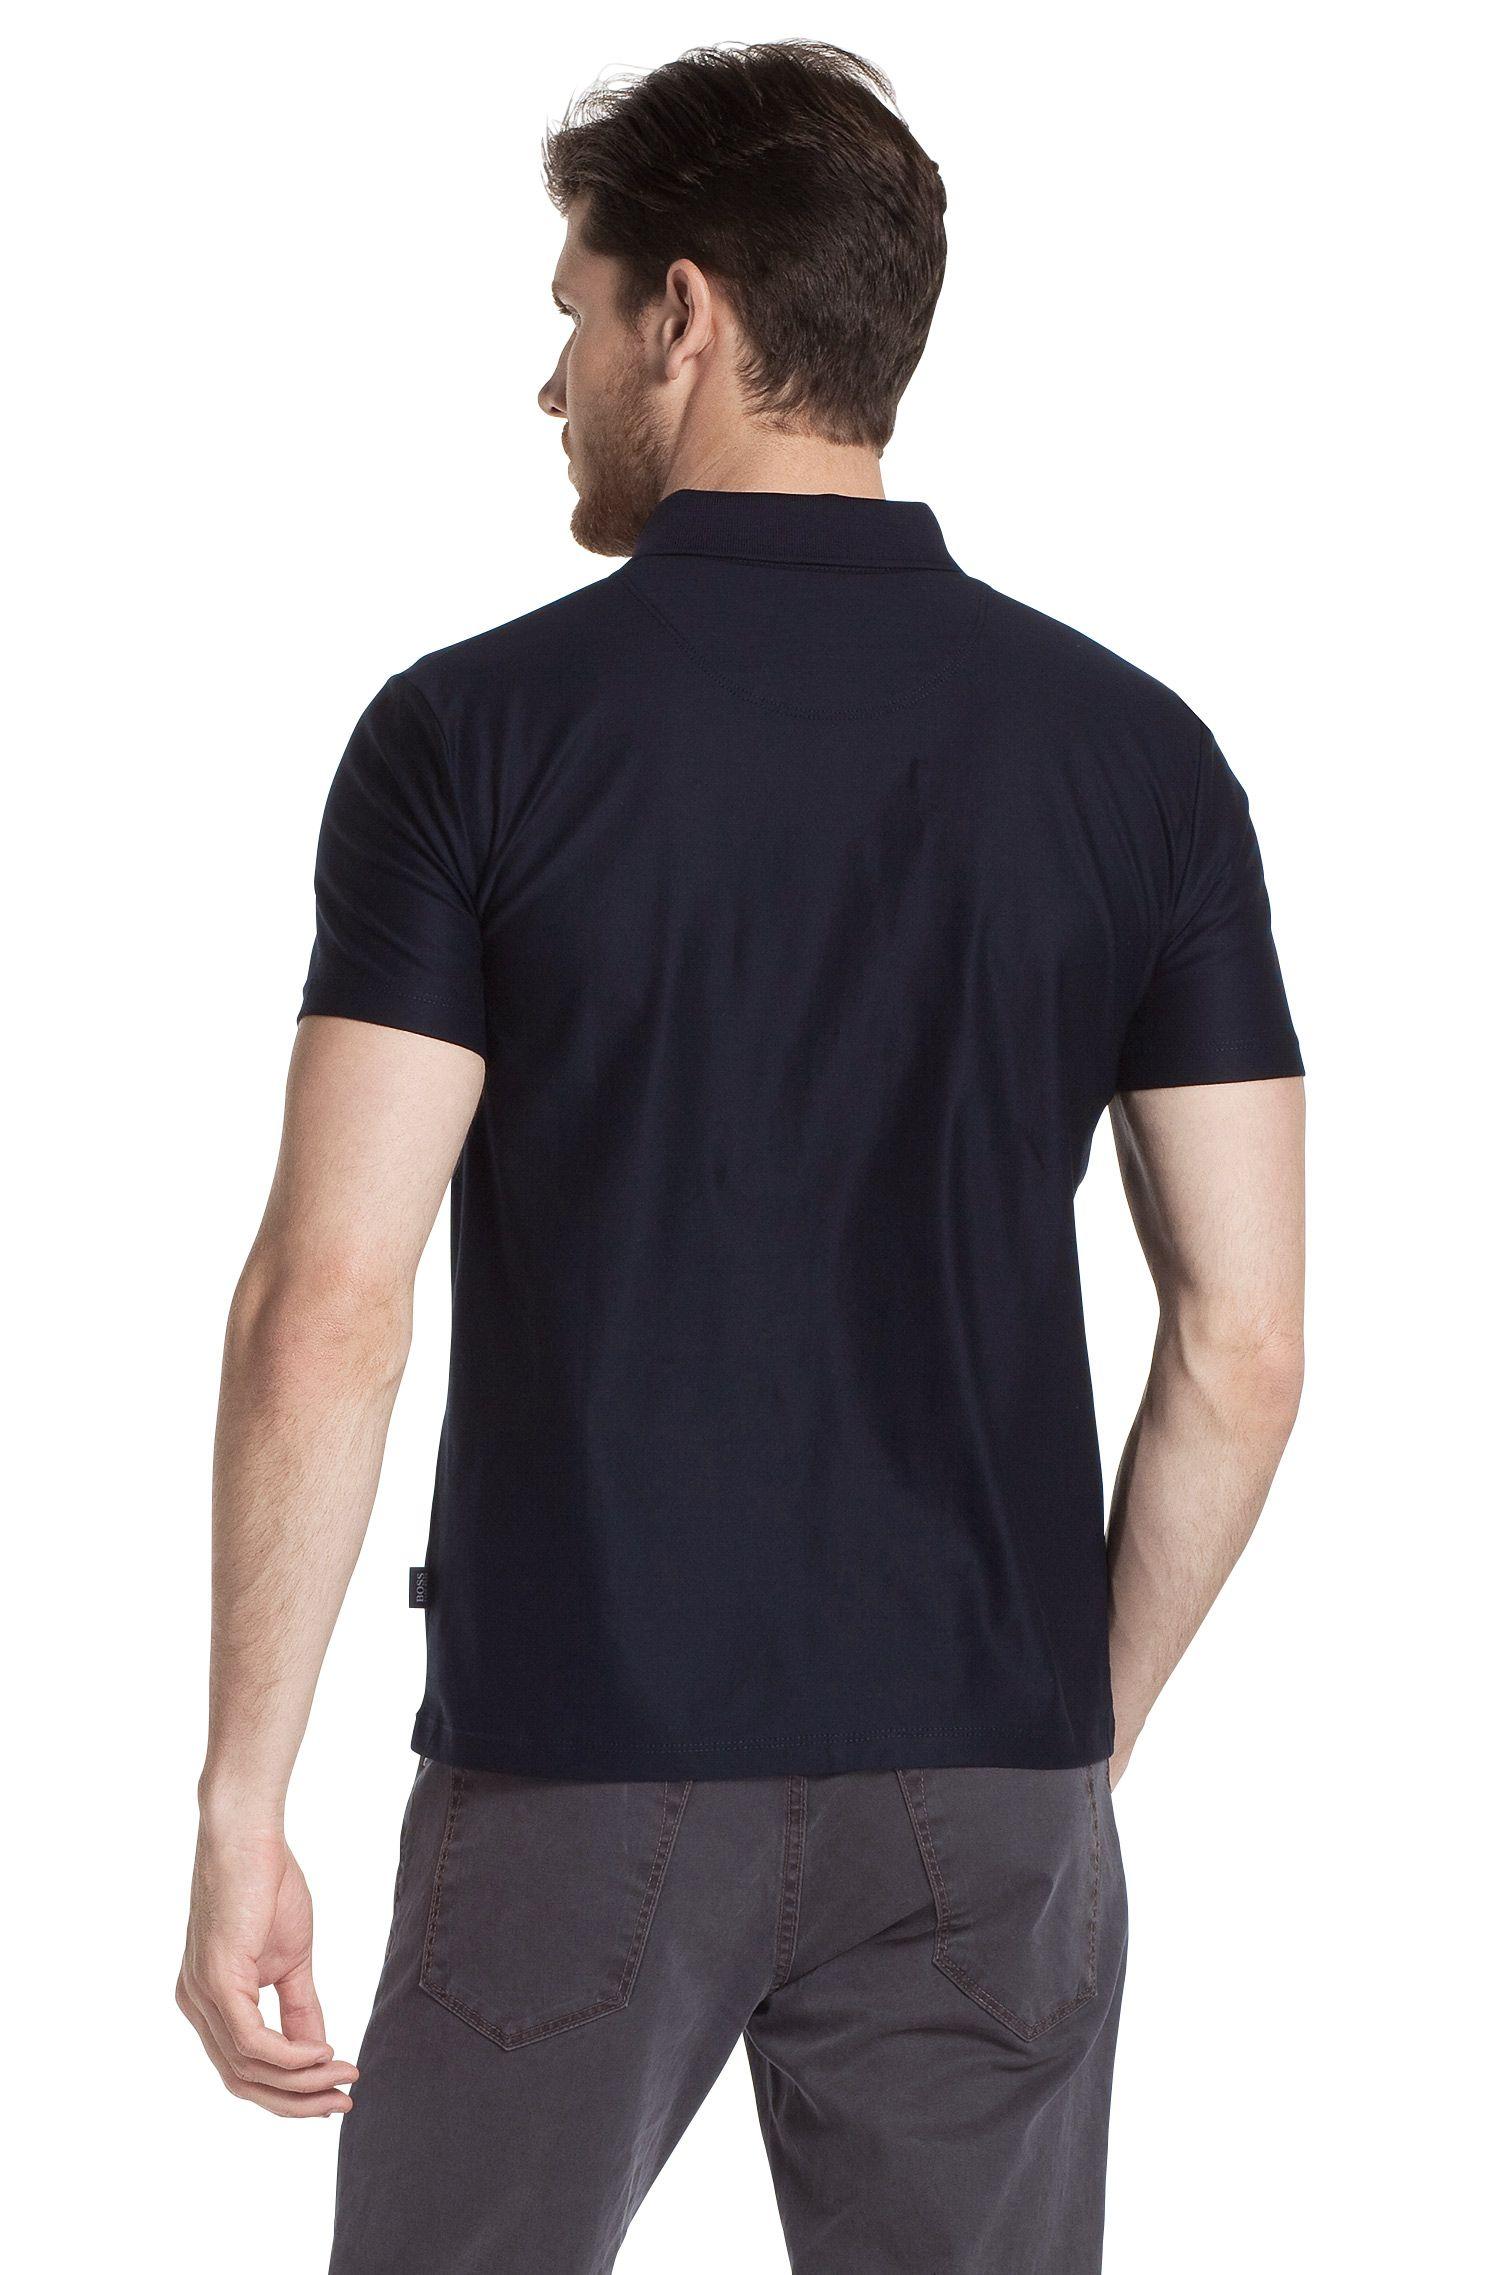 Poloshirt ´Bugnara 11`aus reiner Baumwolle, Dunkelblau